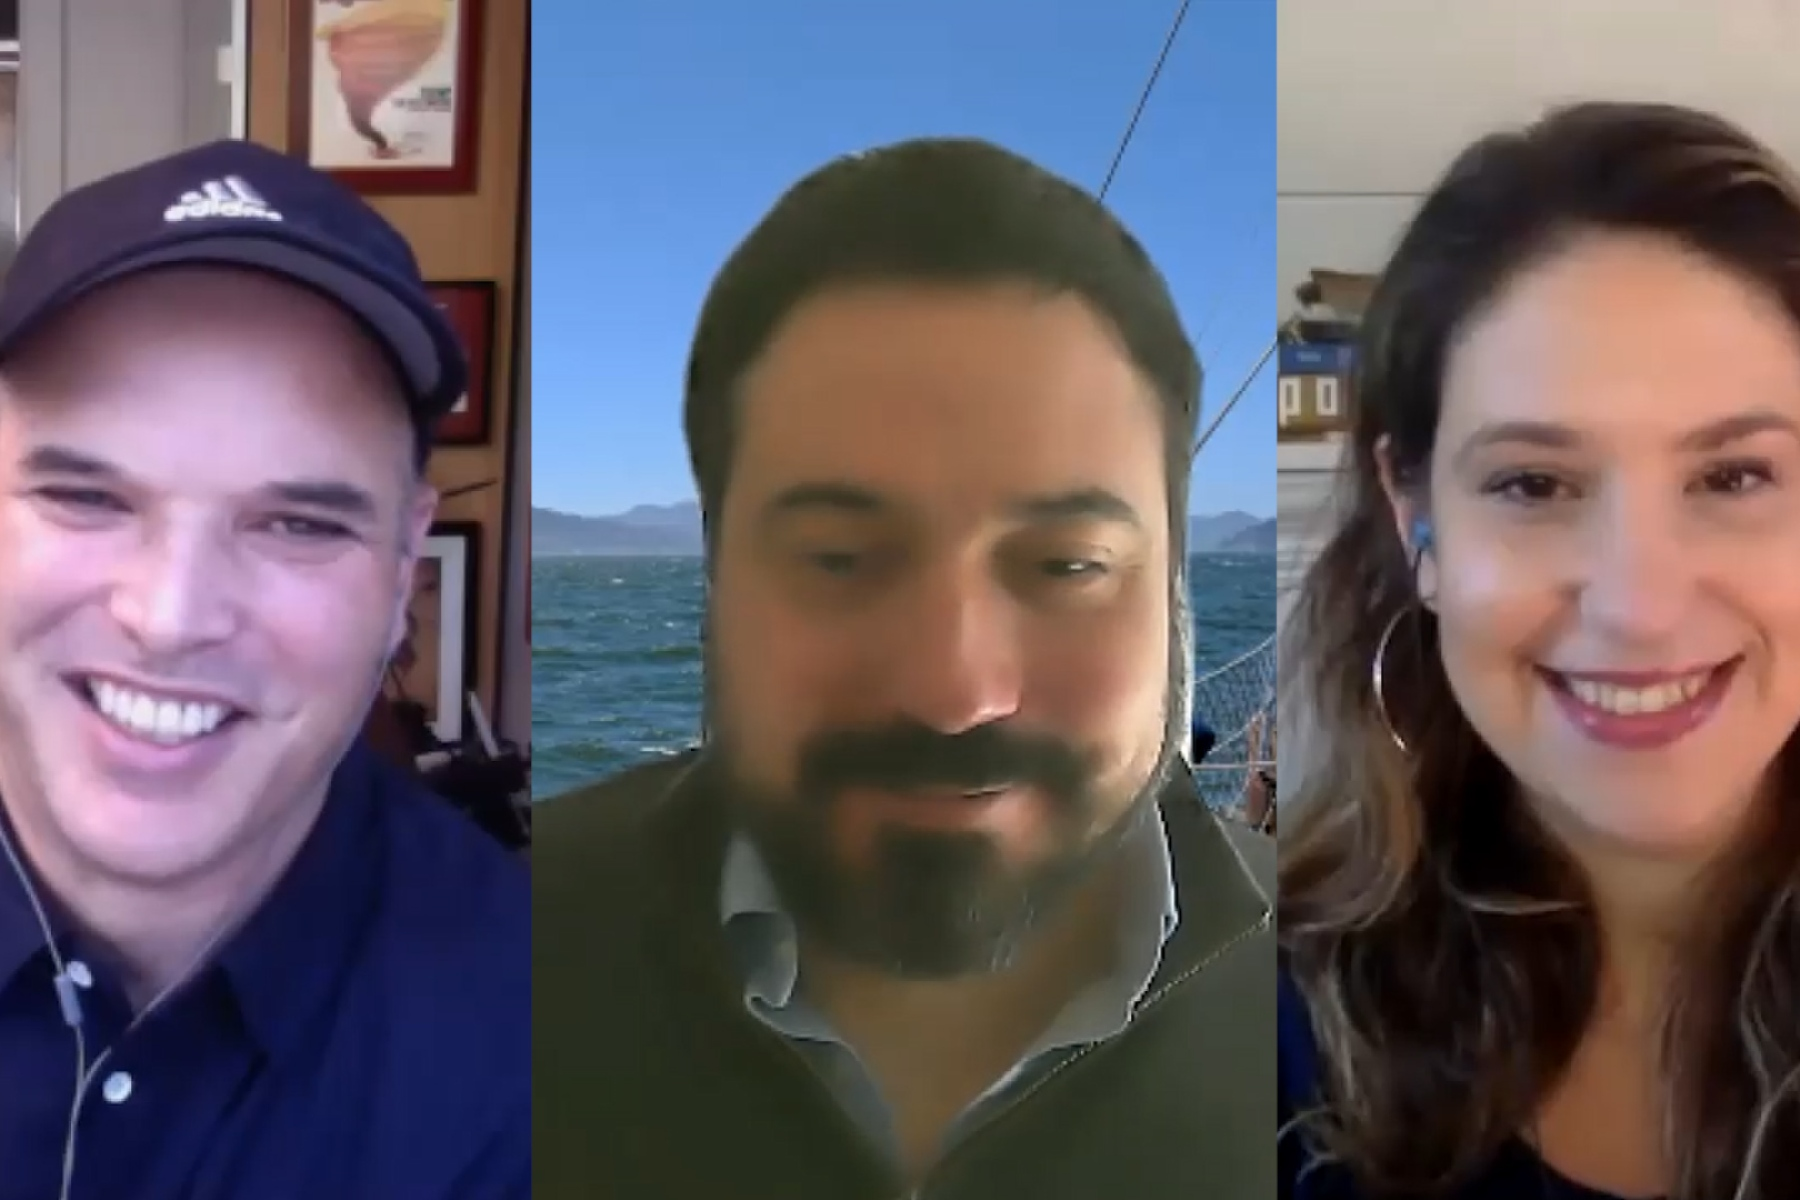 Matt Taibbi and Katie Halper on Useful Idiots with Antonio García Martínez